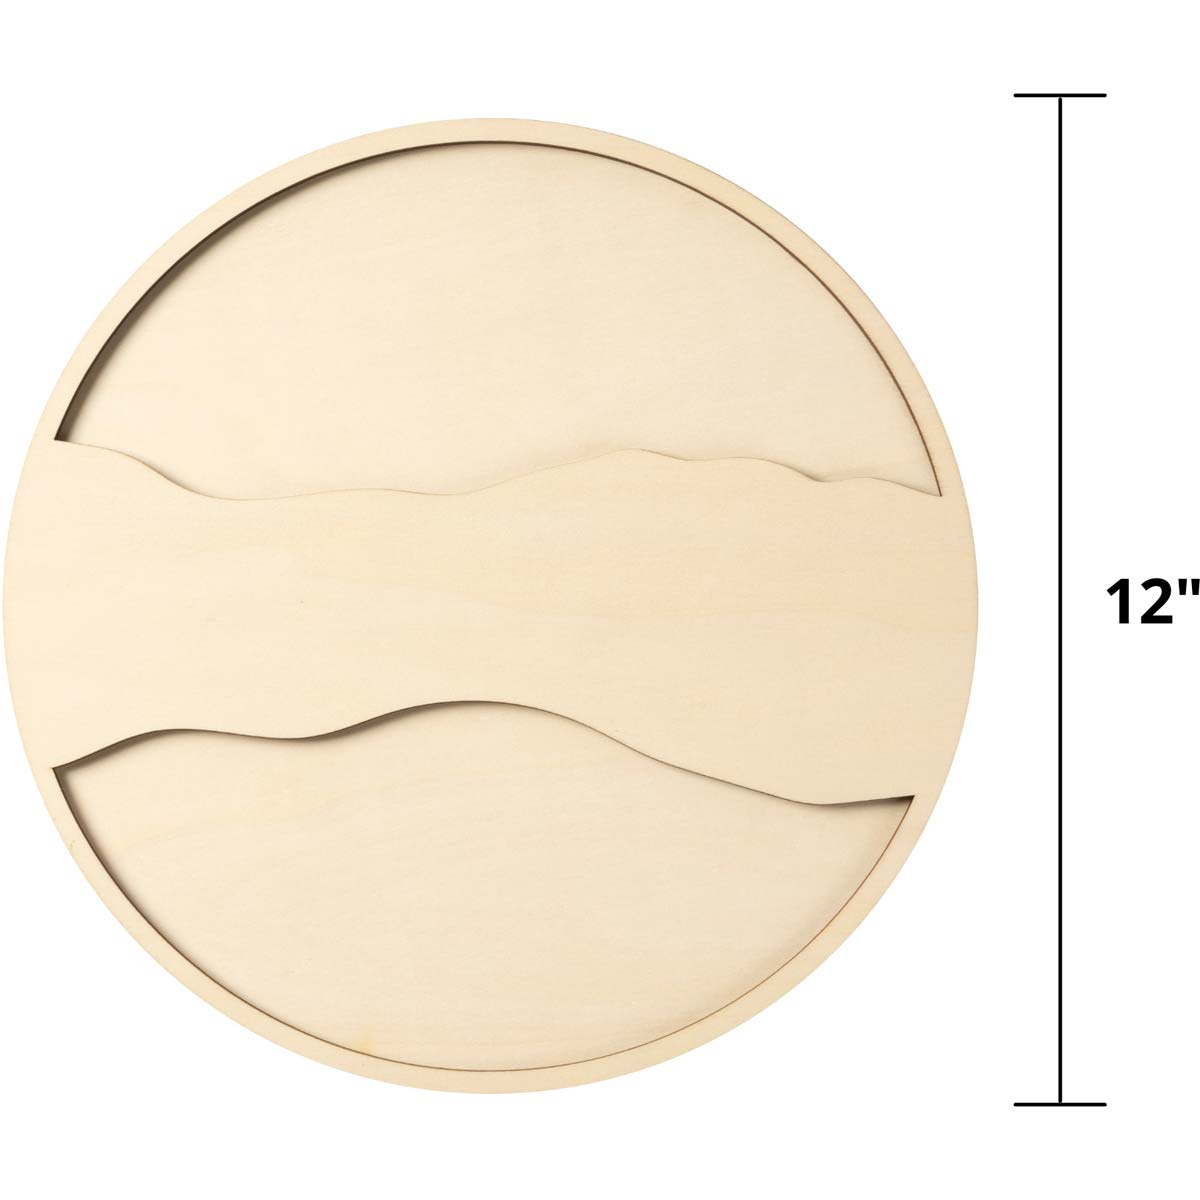 Mod Podge ® Resin Pouring Surface - Circle Plaque - 56644E